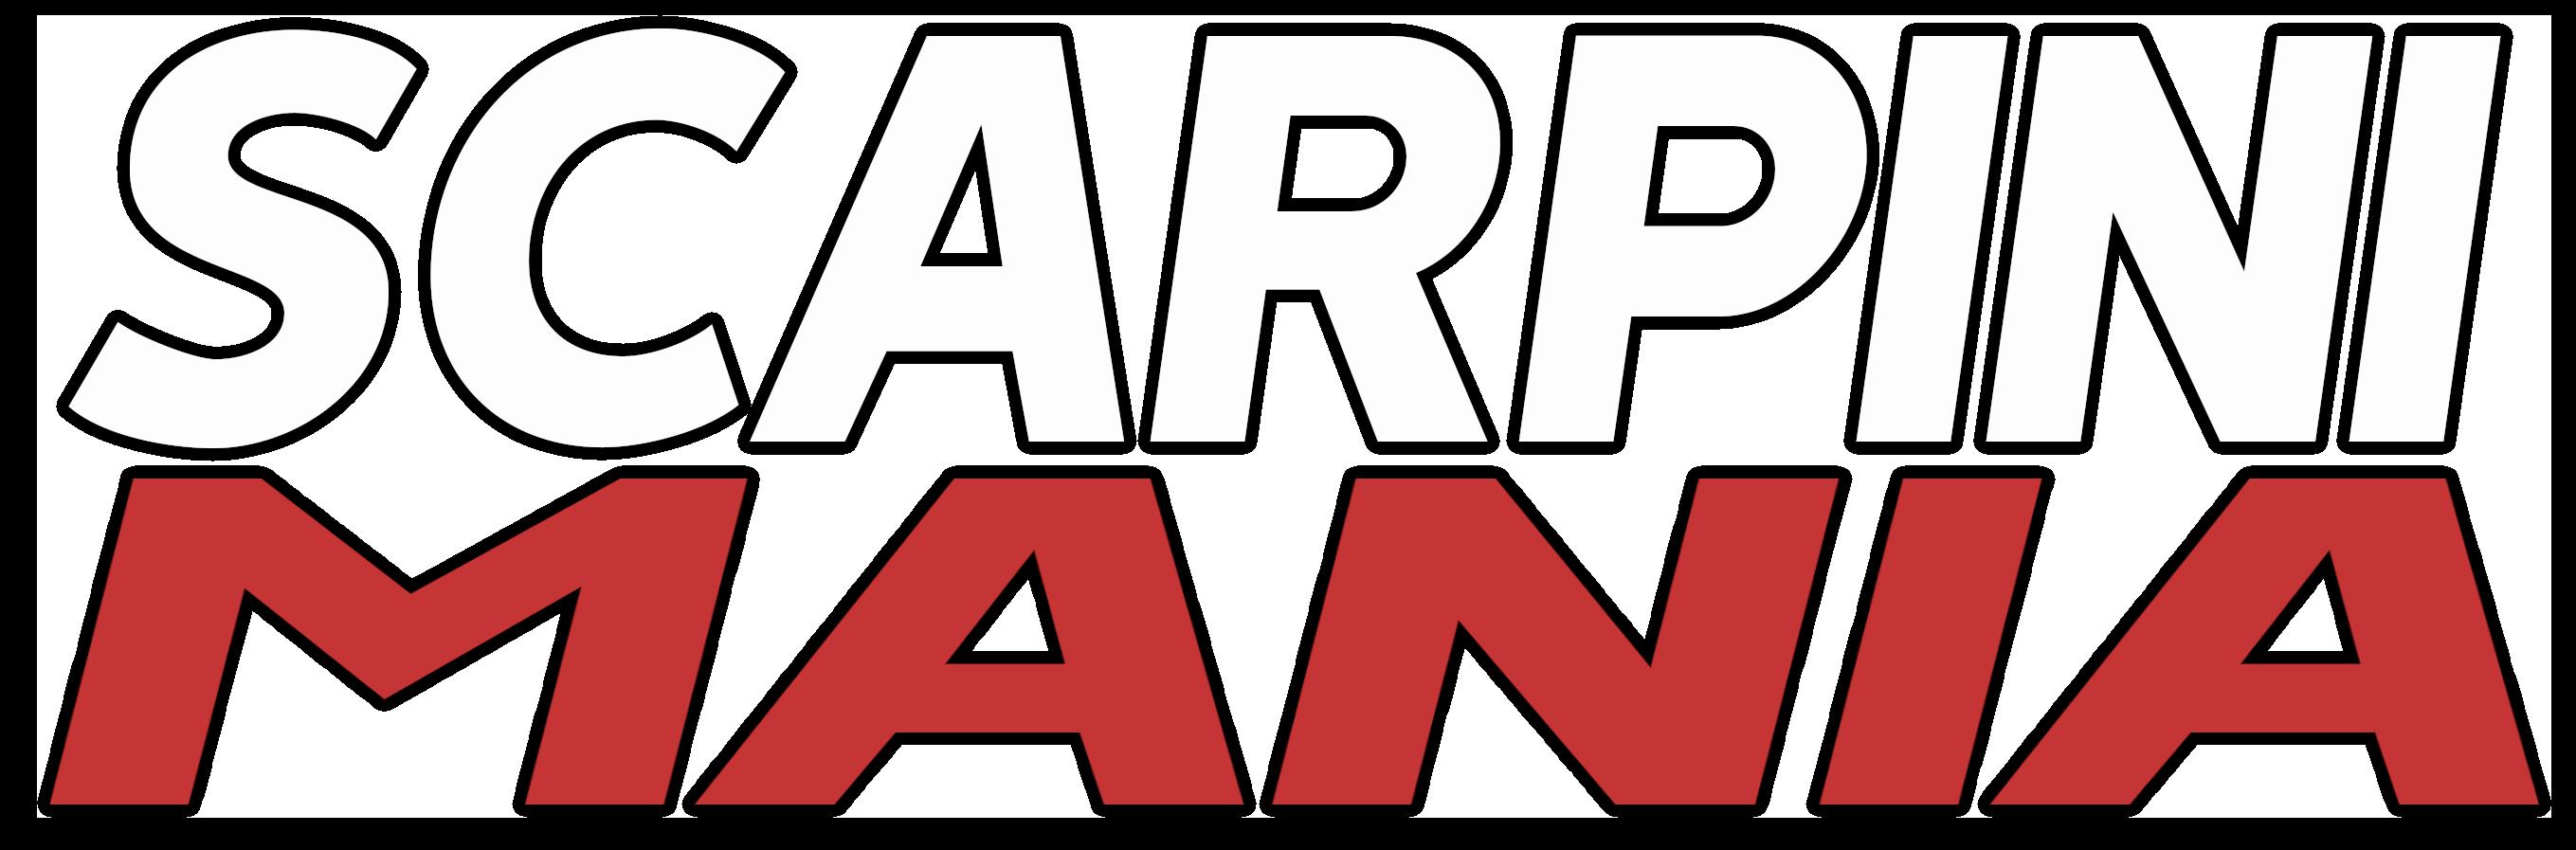 Scarpini Mania.com